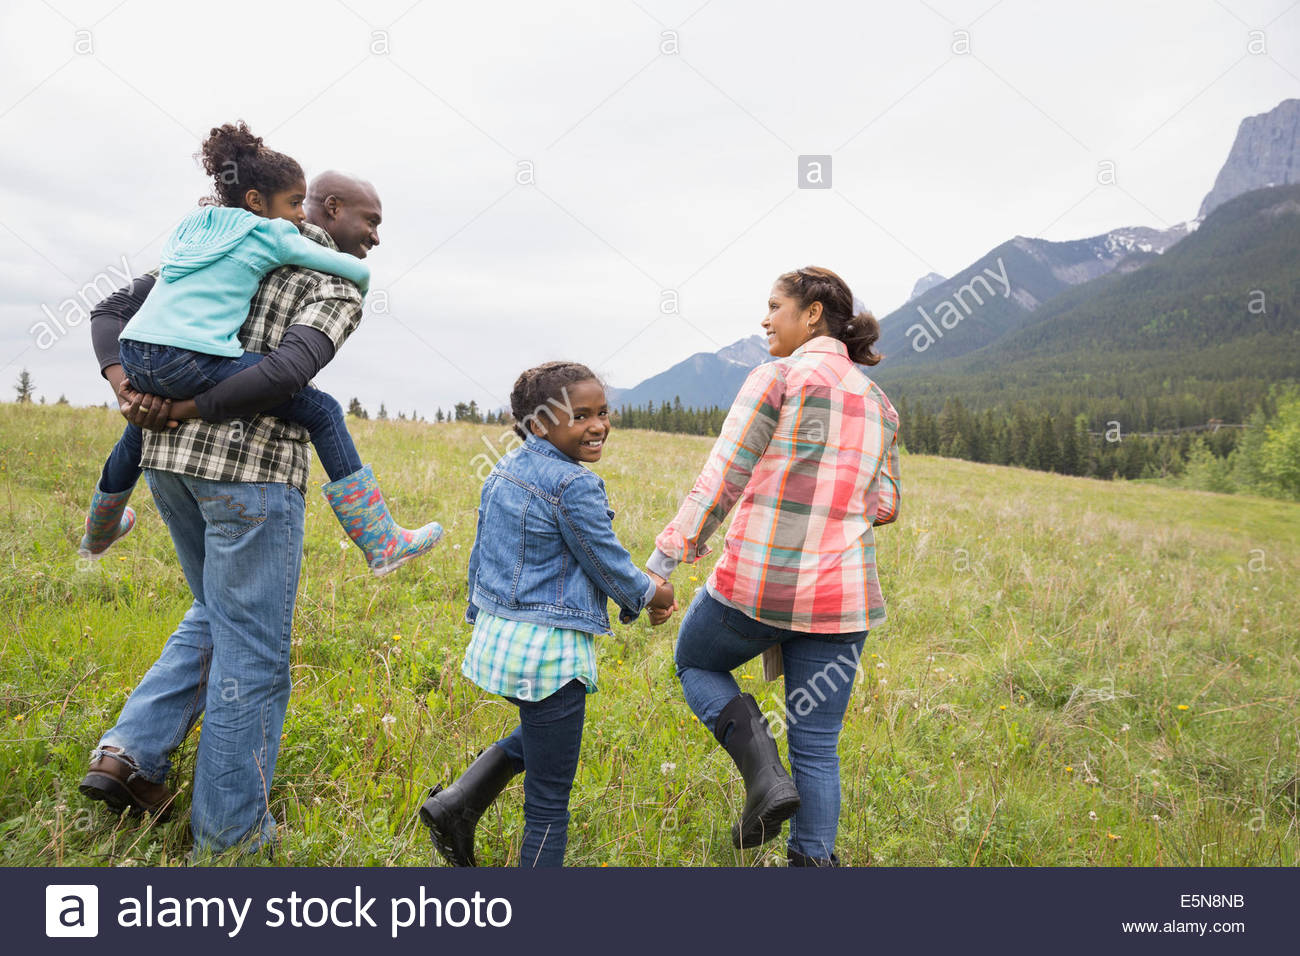 Family walking in grassy field - Stock Image